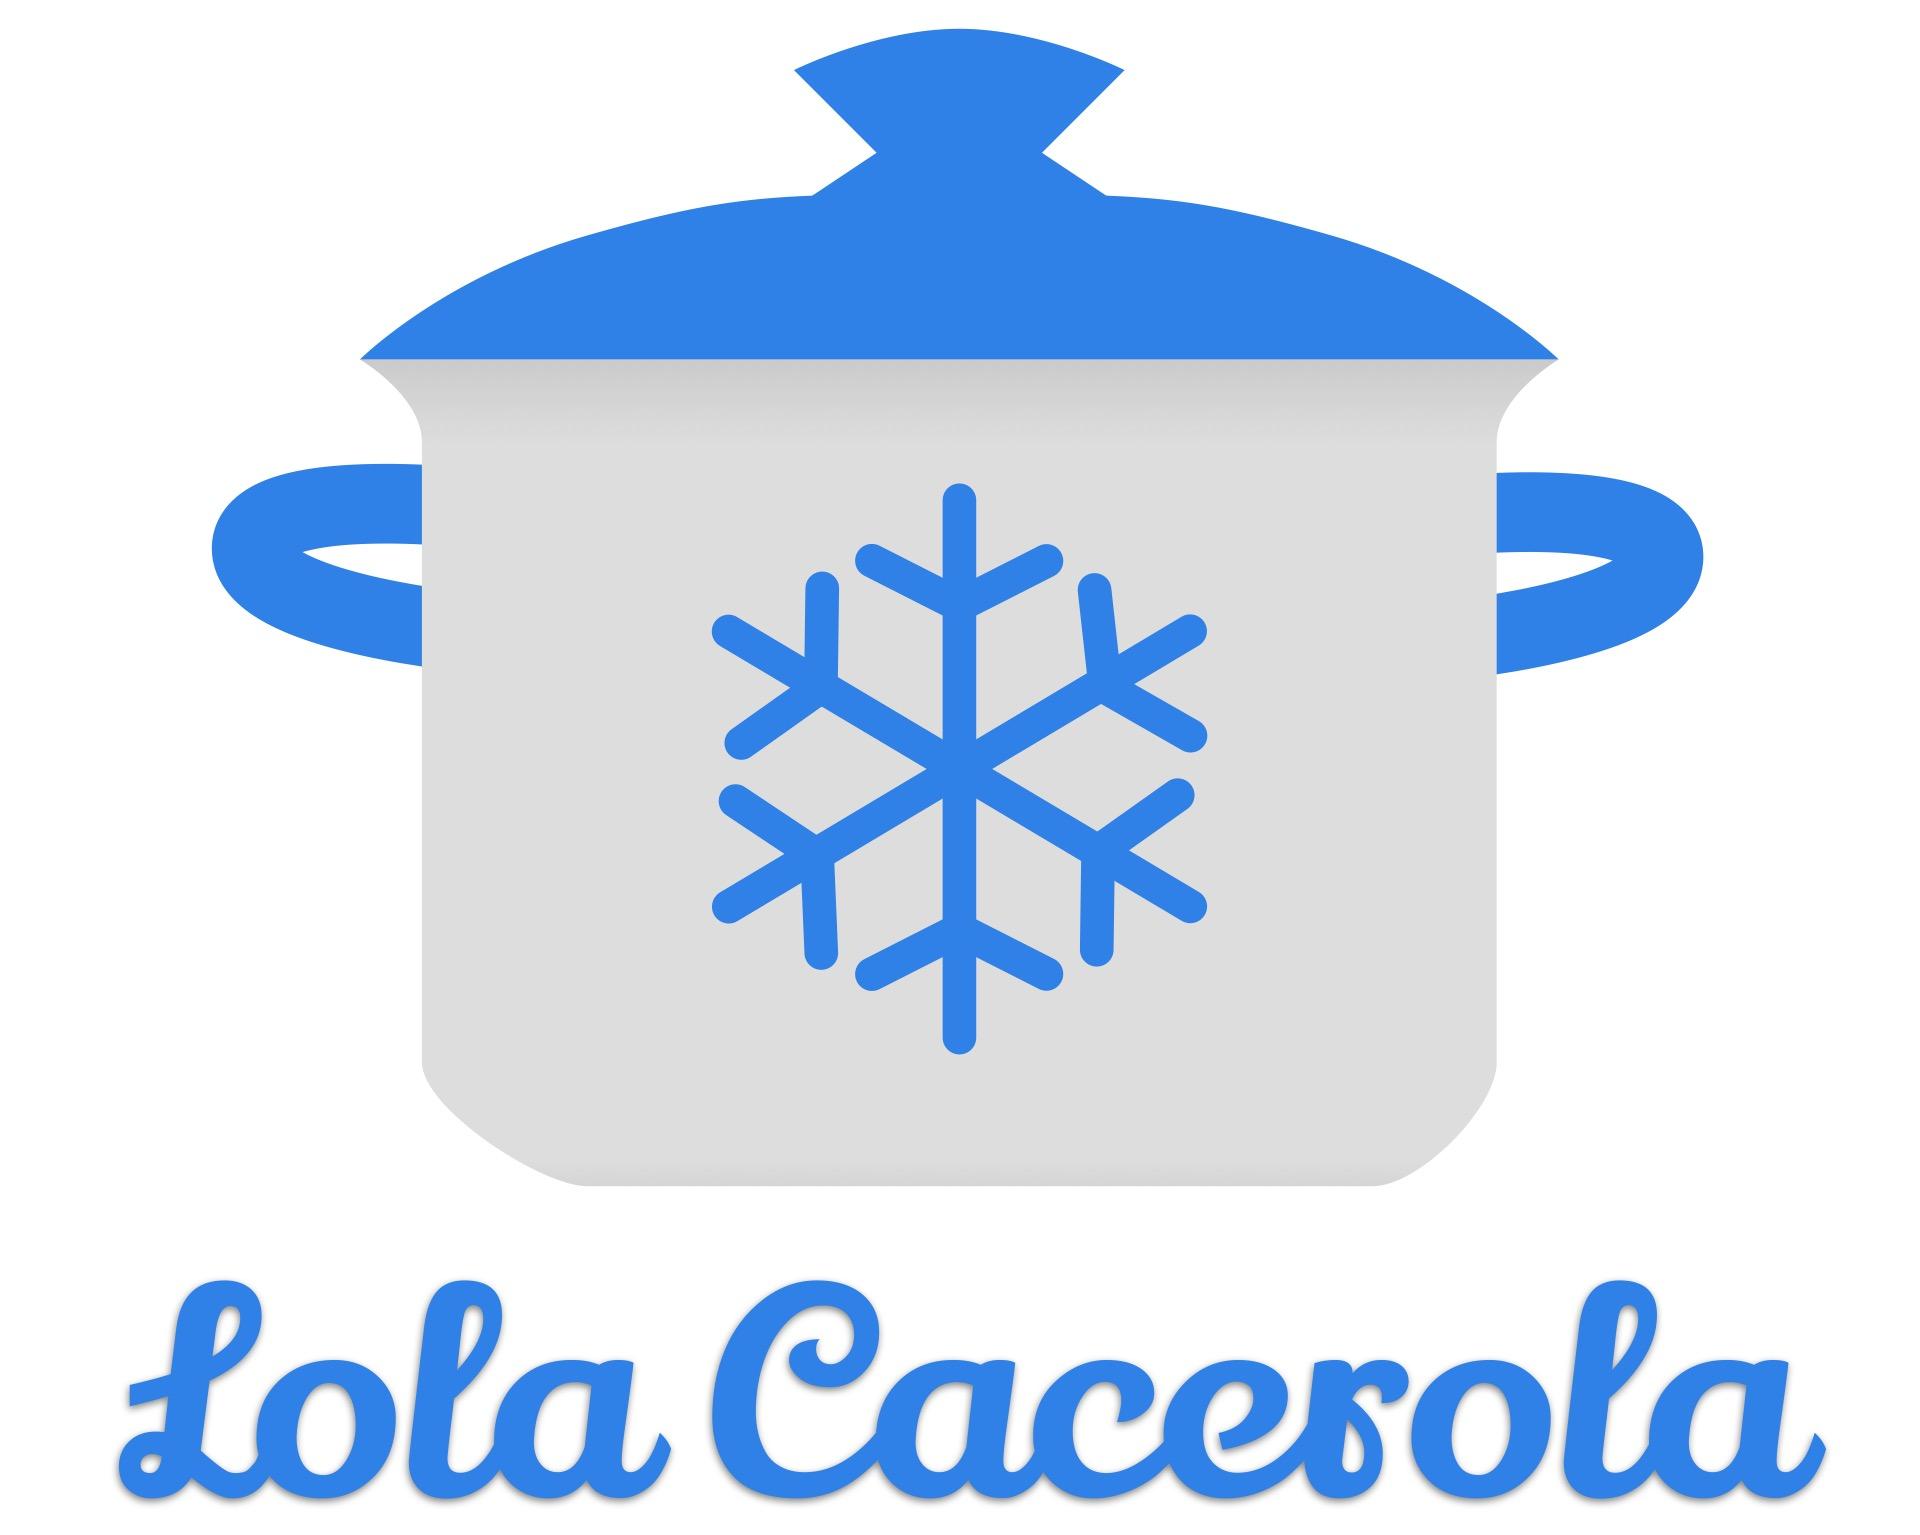 LolaCacerola